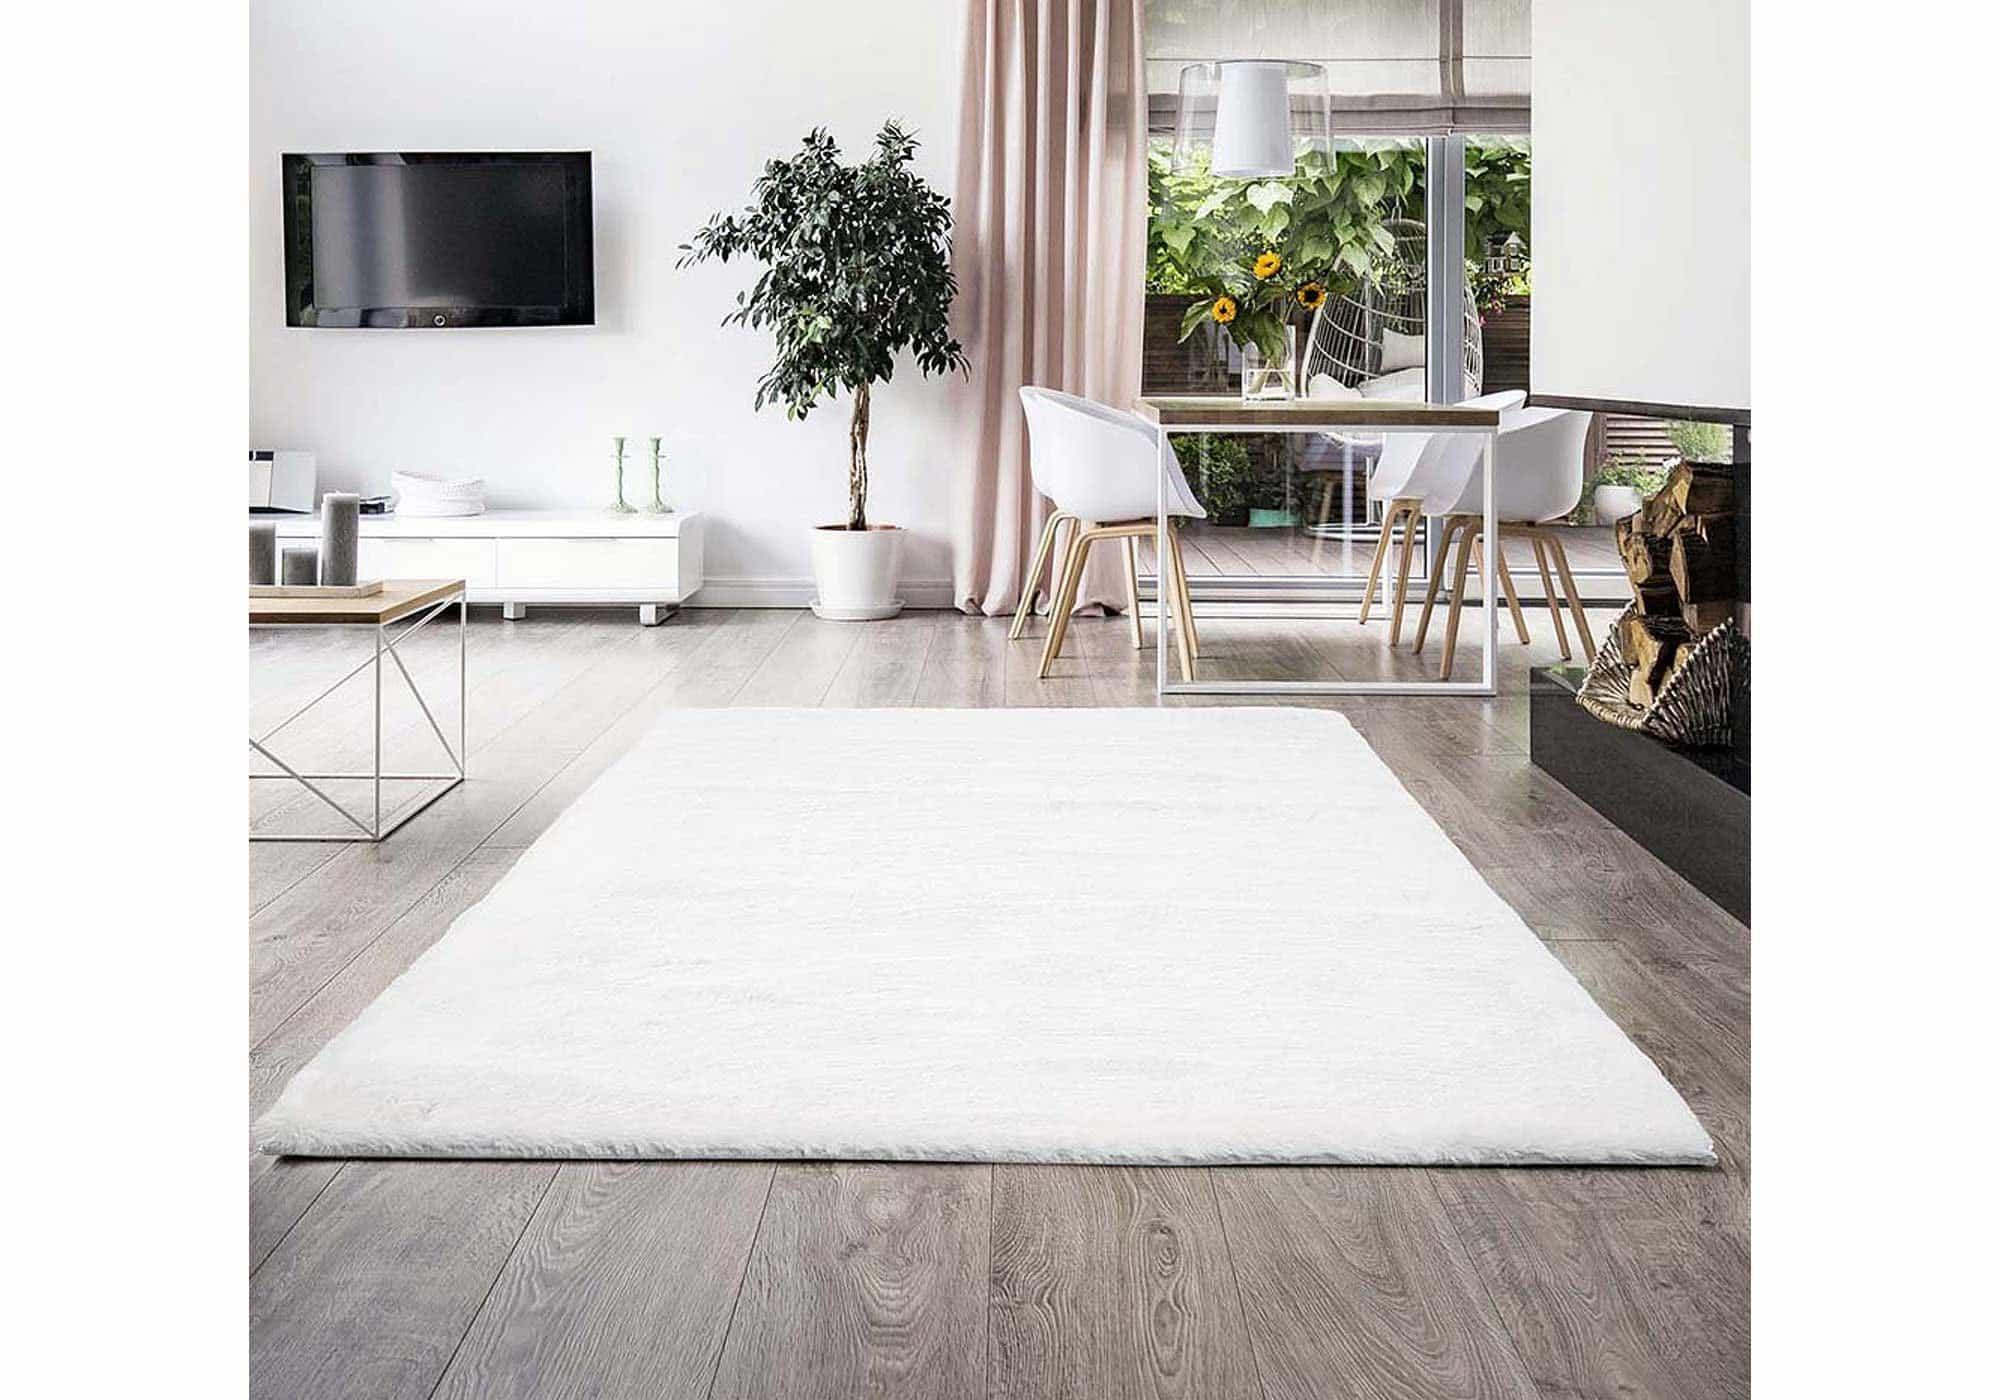 Hochflor-Teppich natur 80 x 150 cm - Soft Touch 900